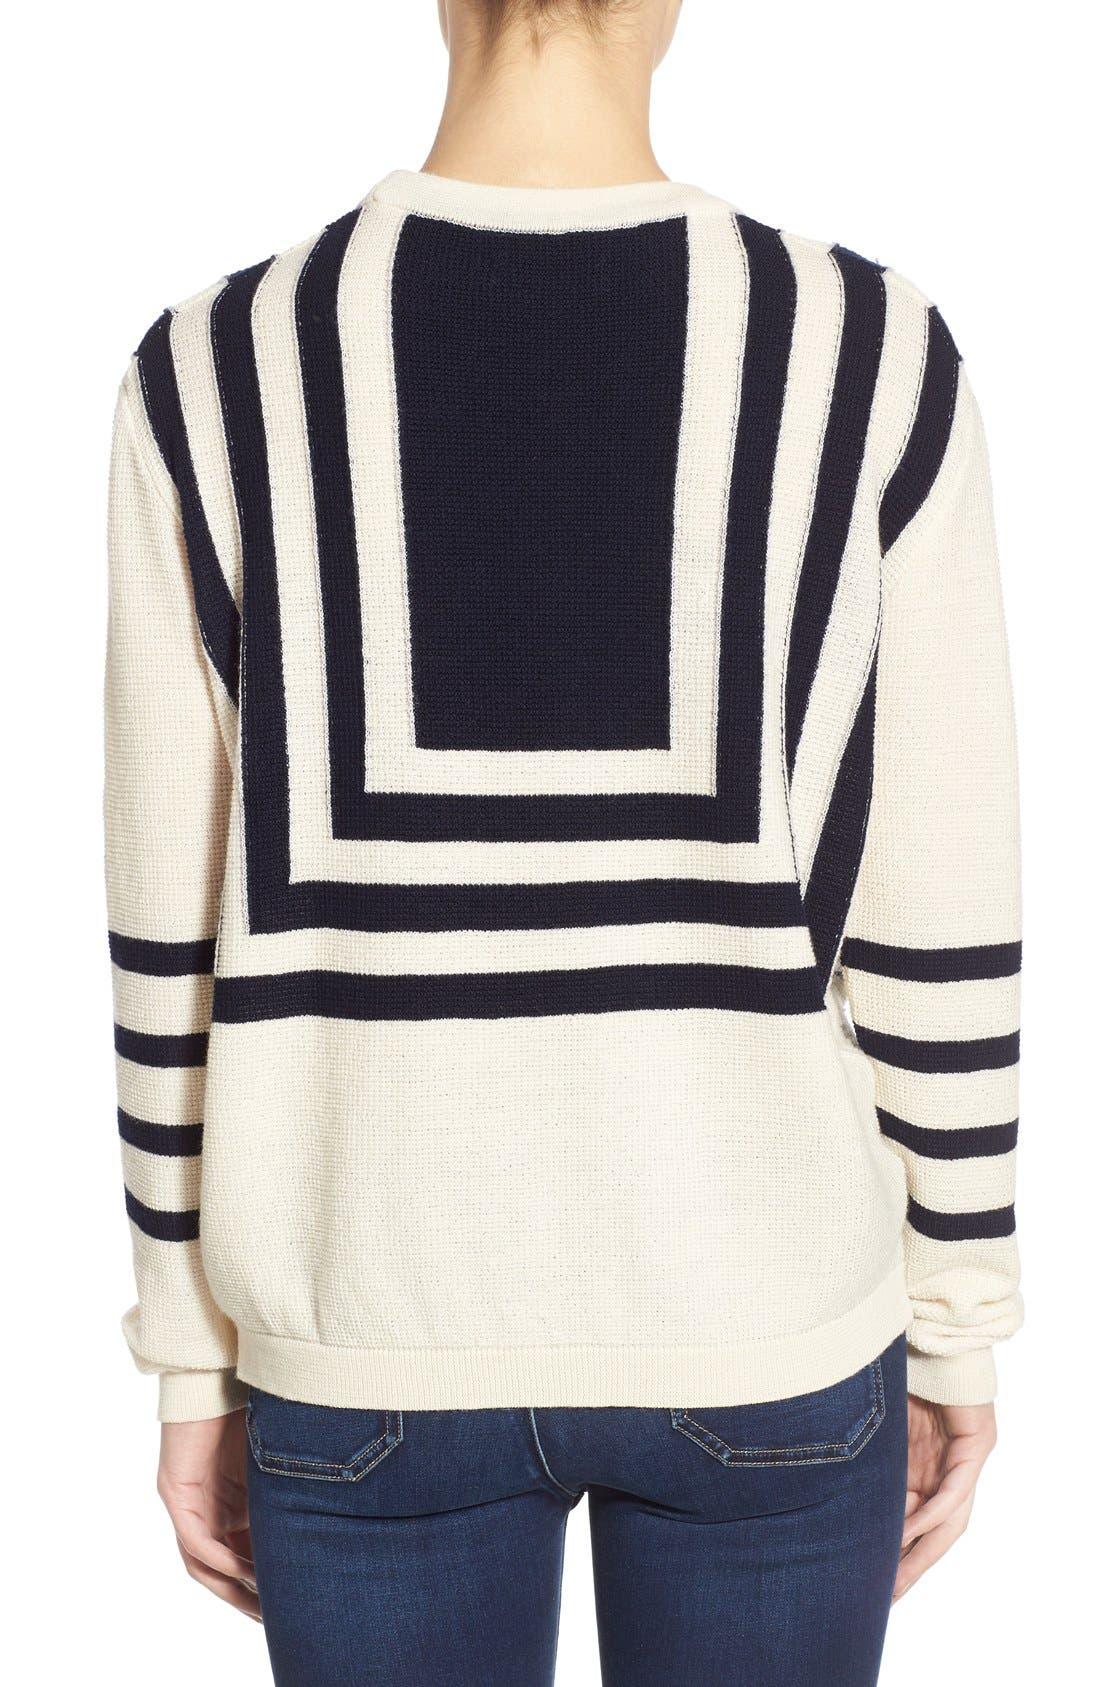 Alternate Image 2  - M.i.h. Jeans 'Bib Breton' Crewneck Sweater